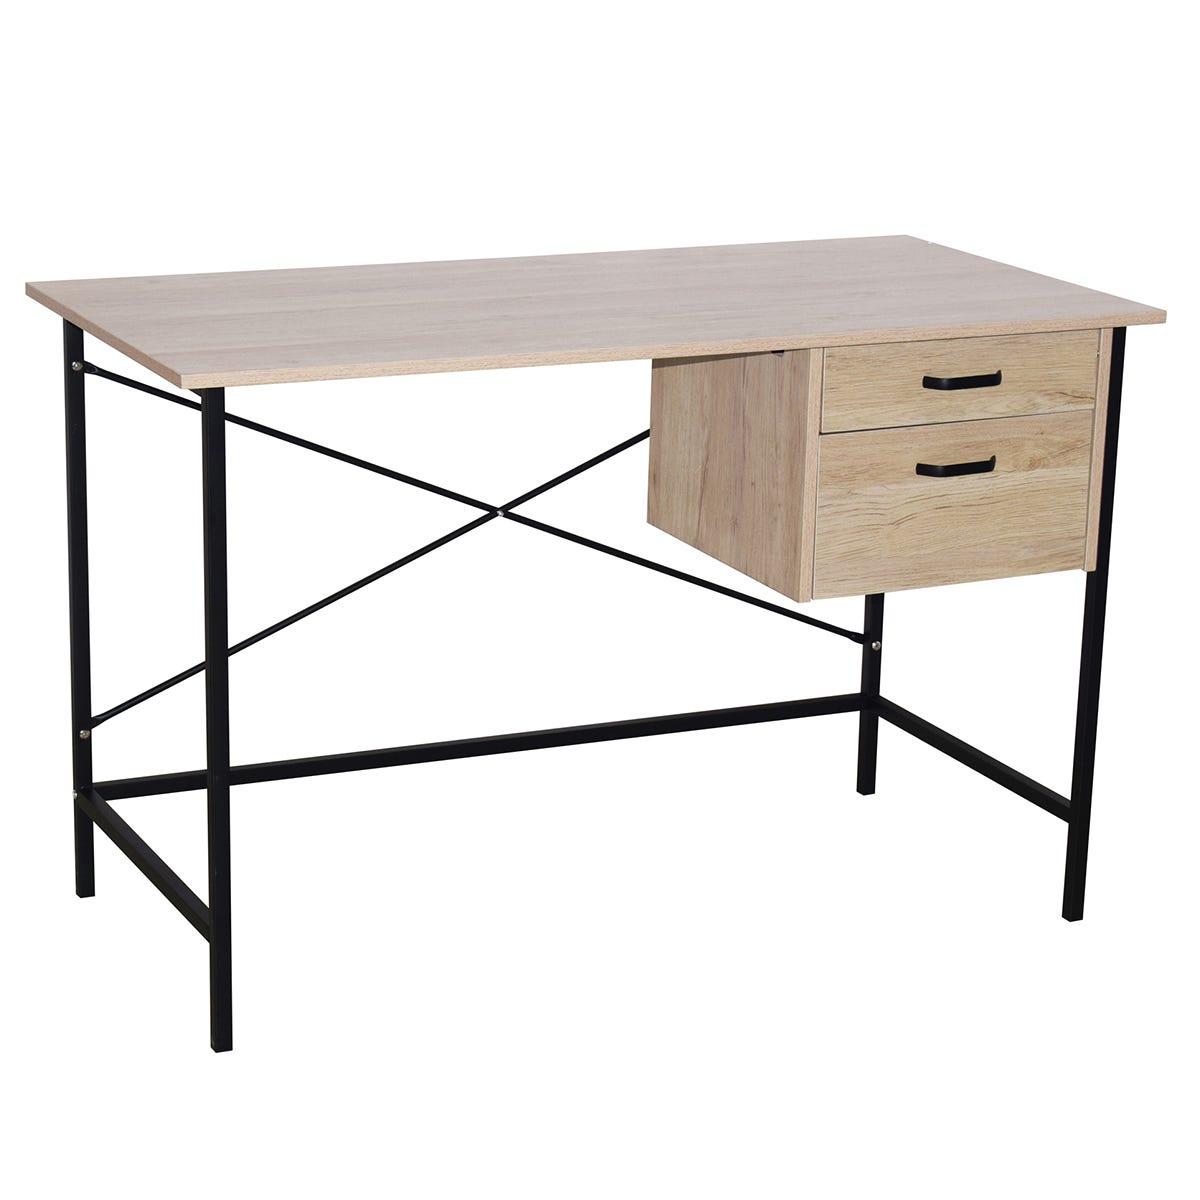 Core Products Loft Home Office 2 Drawer Desk with Oak Effect & Grey Metal Legs